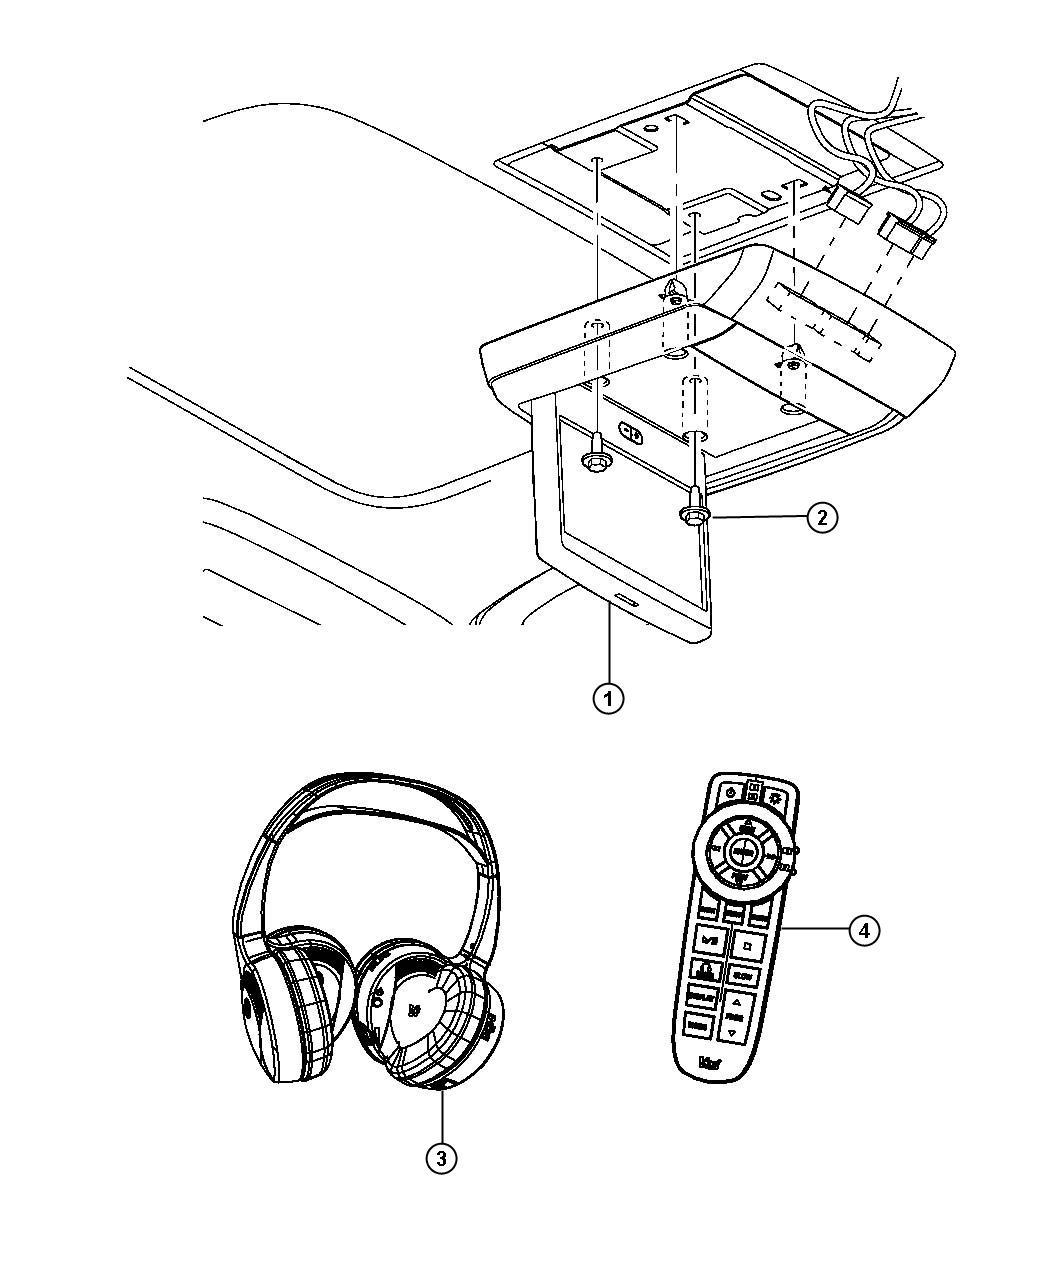 Jeep Patriot Headphones. Wireless. Expmedia, rft, reda